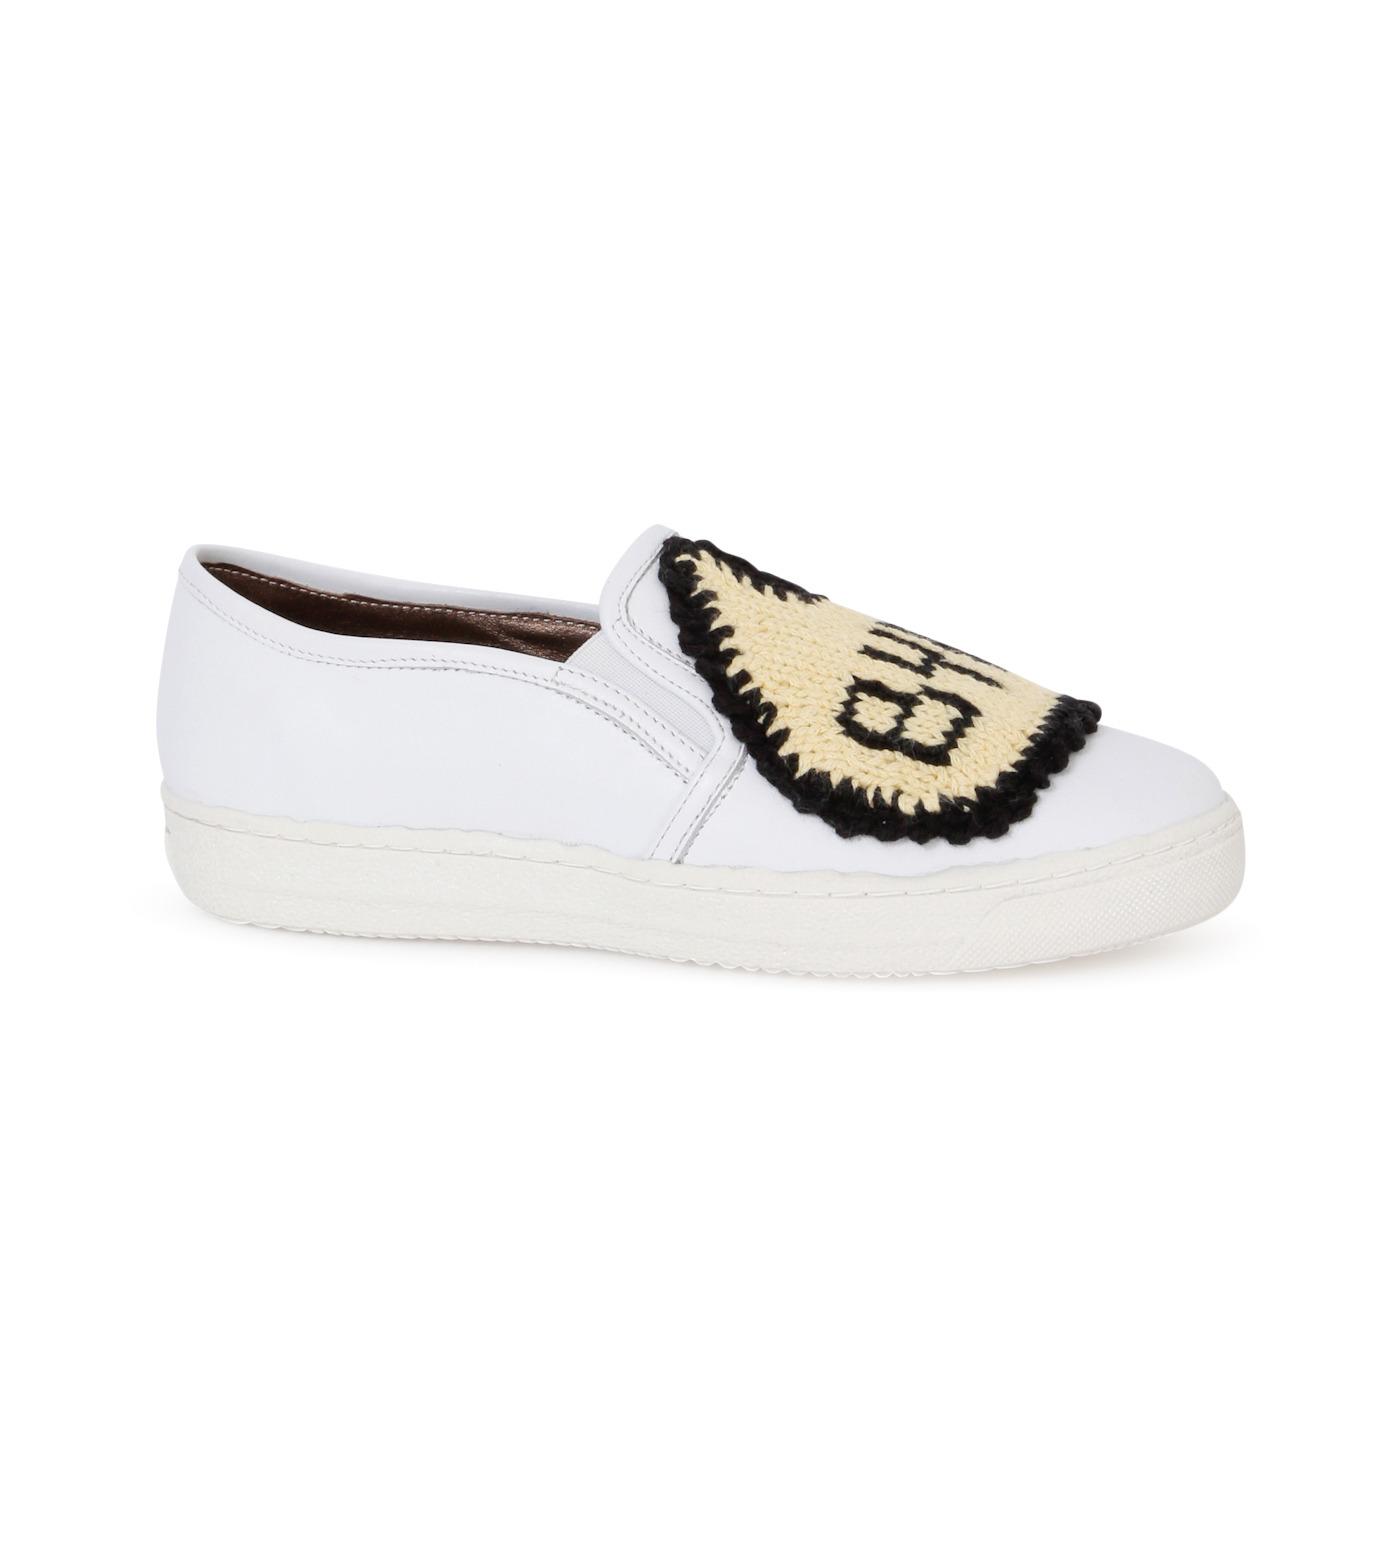 Michaela Buerger(ミカエラ バーガー)のSneaker Bye Bye-WHITE(スニーカー/sneaker)-BYEBYE-4 拡大詳細画像1